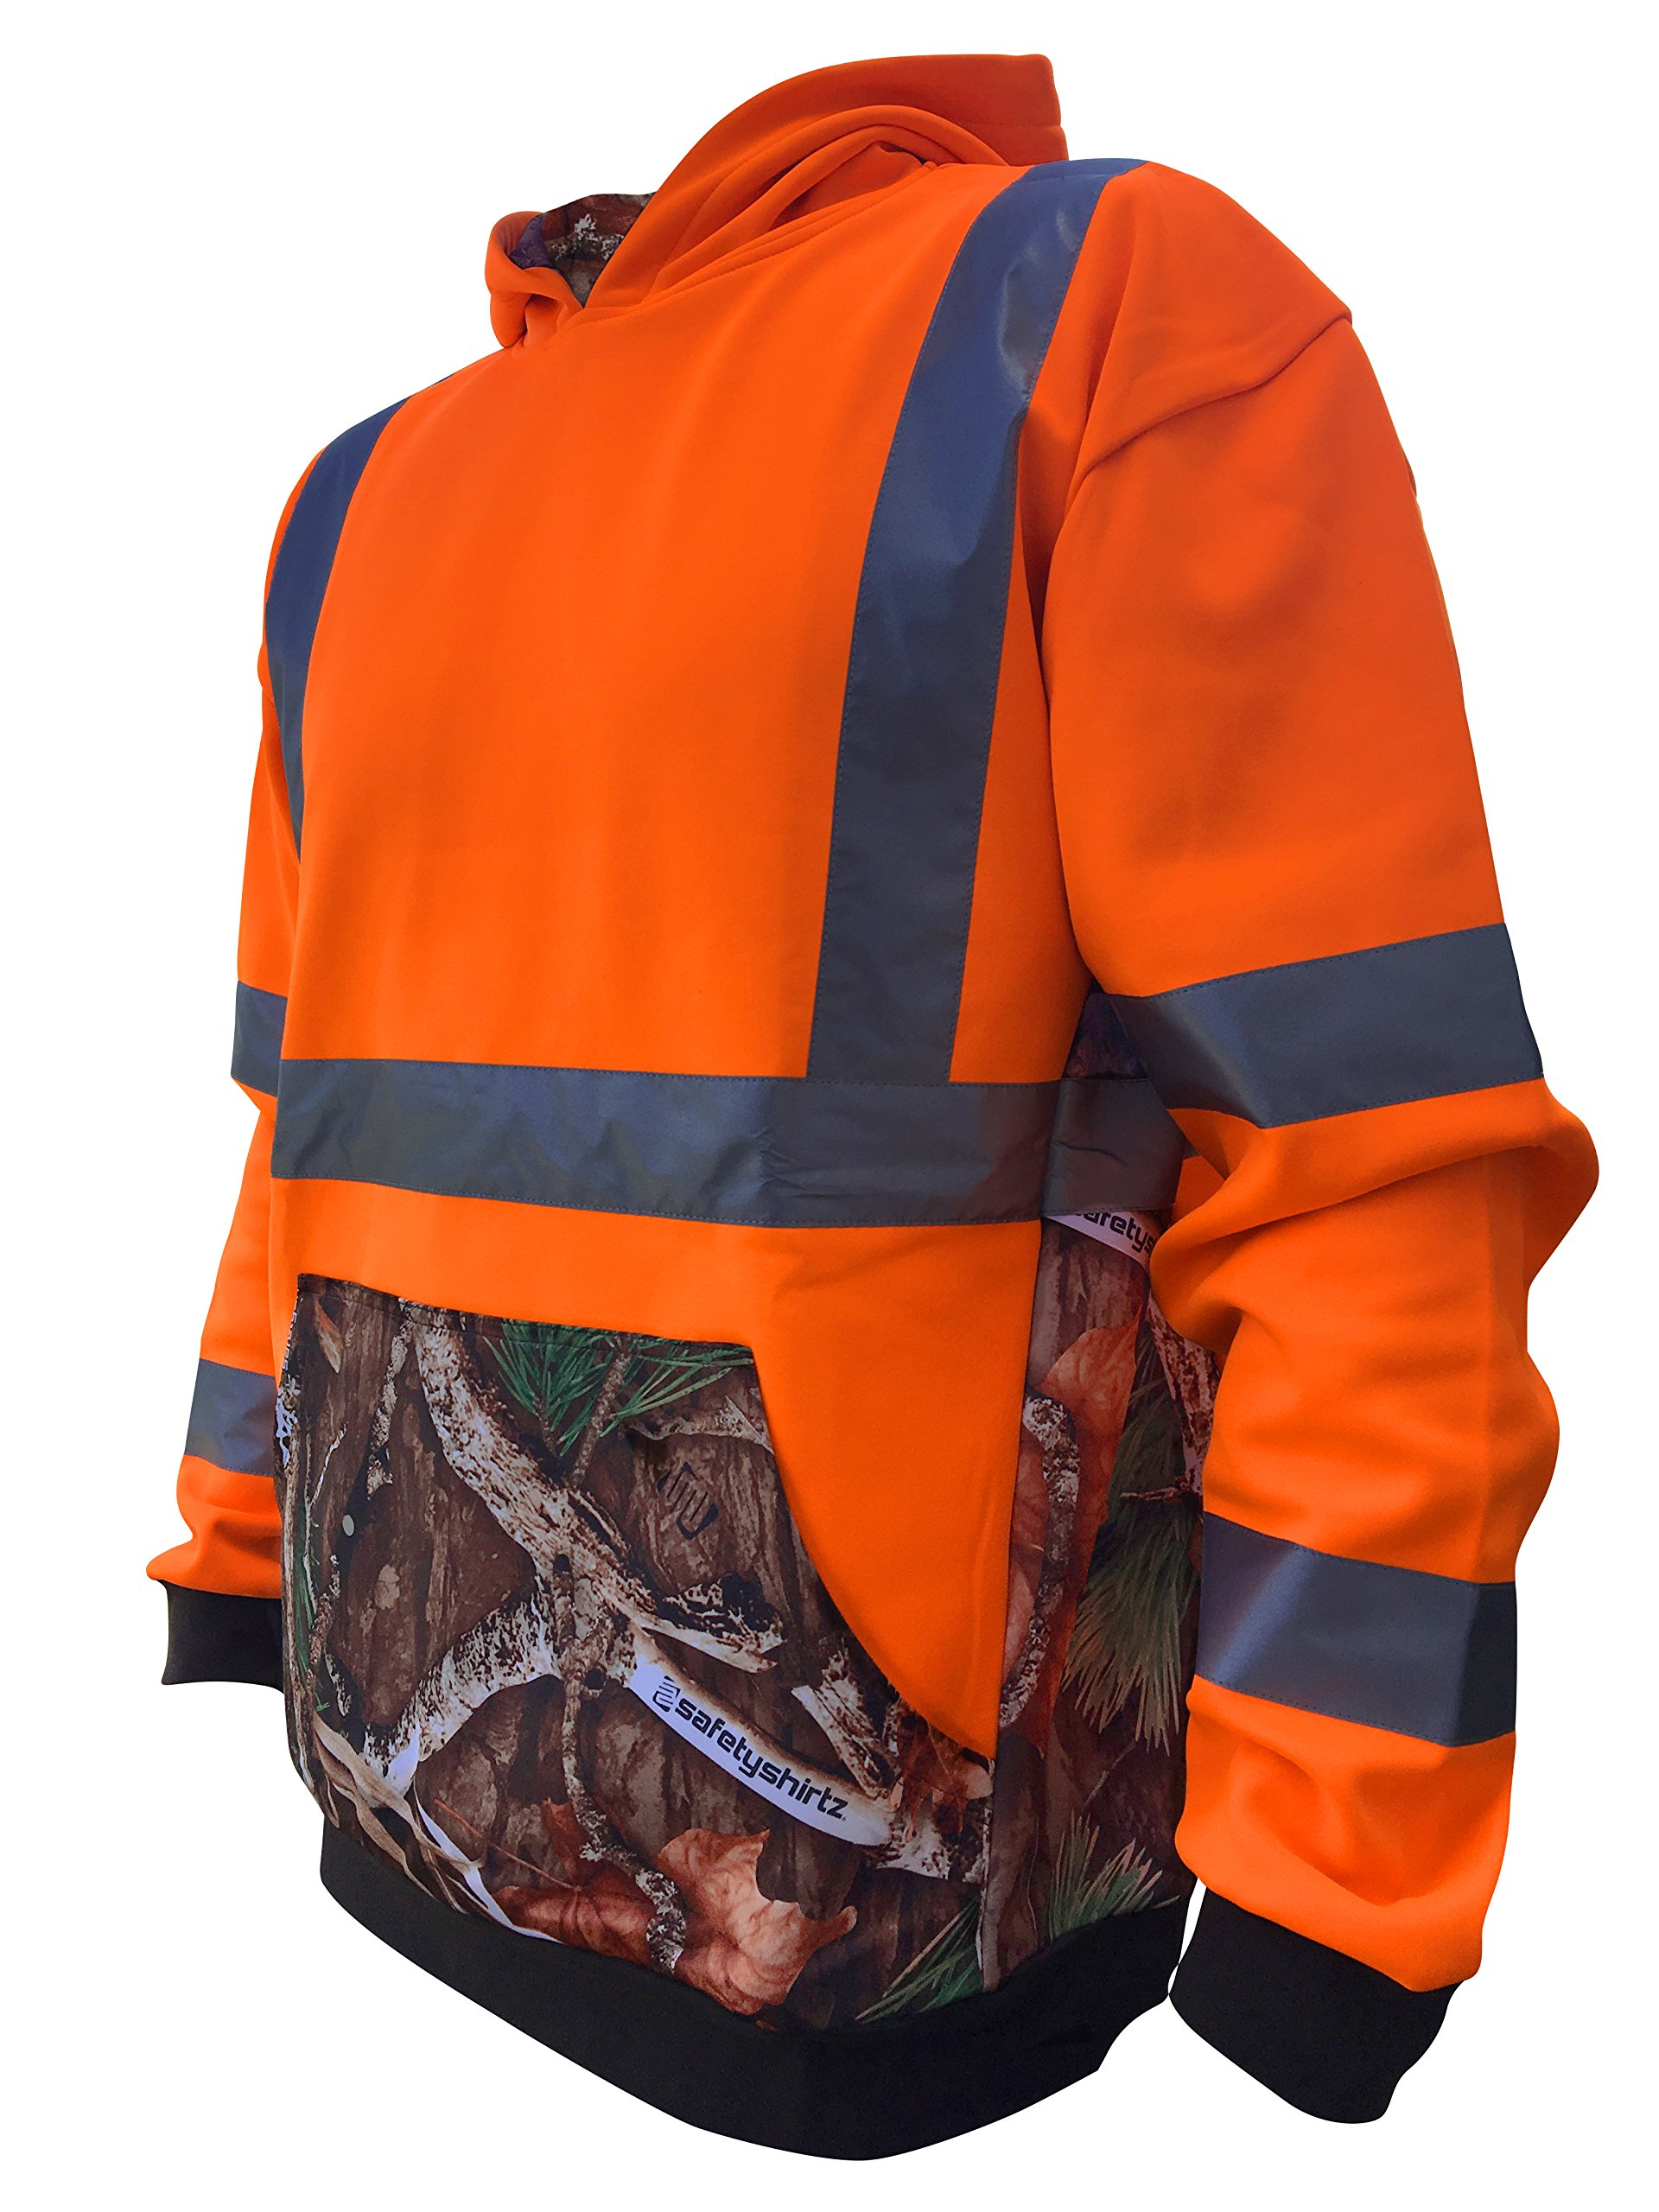 SafetyShirtz SS360 Deepwoods Camo Safety Hoody ANSI Class 3 S